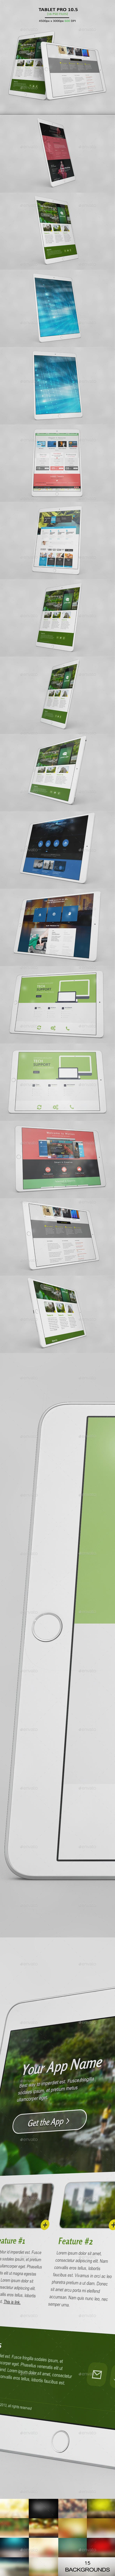 GraphicRiver Tablet Pro 10.5 App MockUp 2017 Vol2 20366074